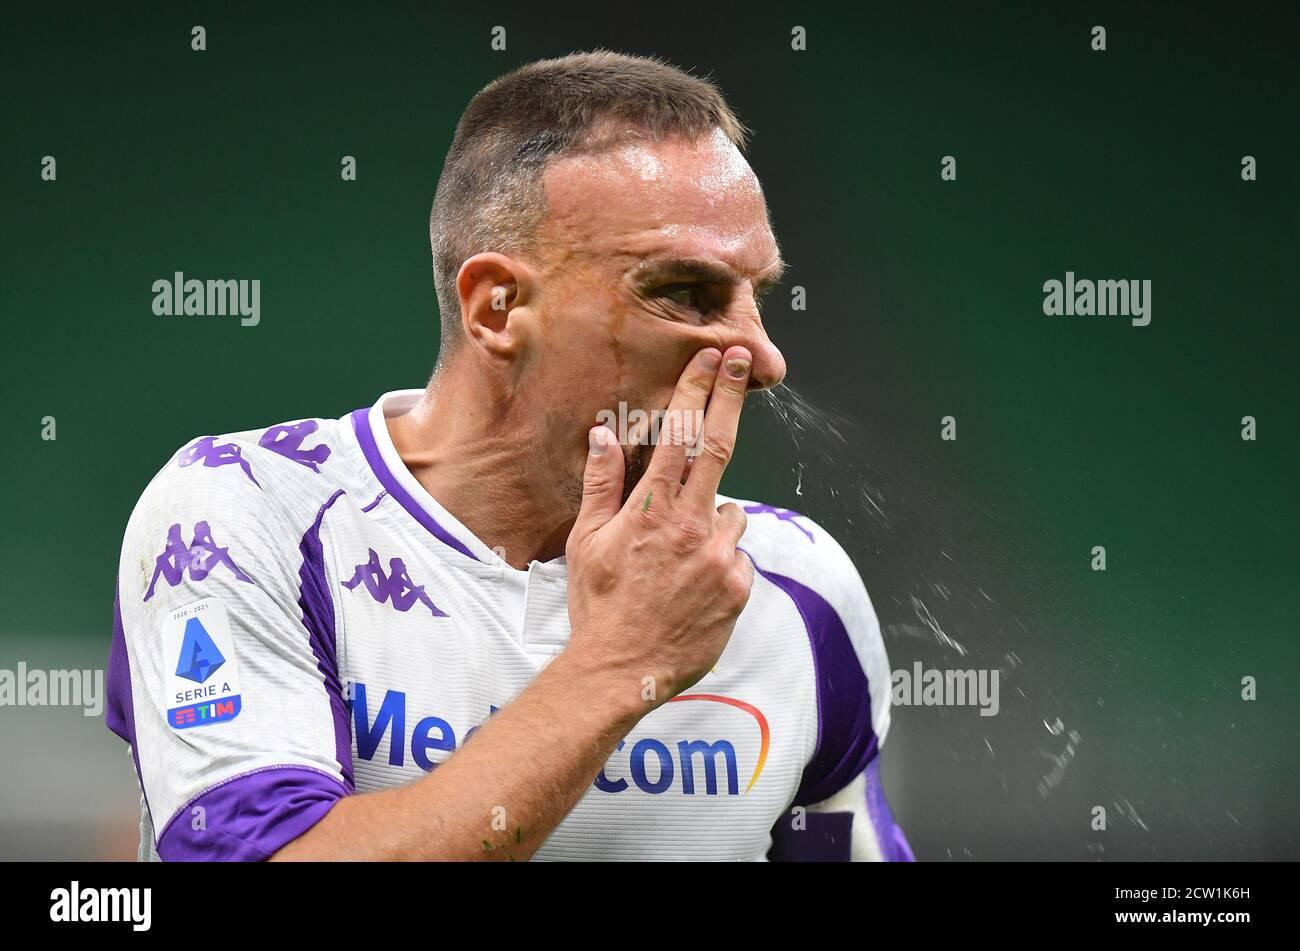 Football football - série A - Inter Milan / Fiorentina - San Siro, Milan, Italie - 26 septembre 2020. Franck Ribery REUTERS/Daniele Mascolo de Fiorentina Banque D'Images